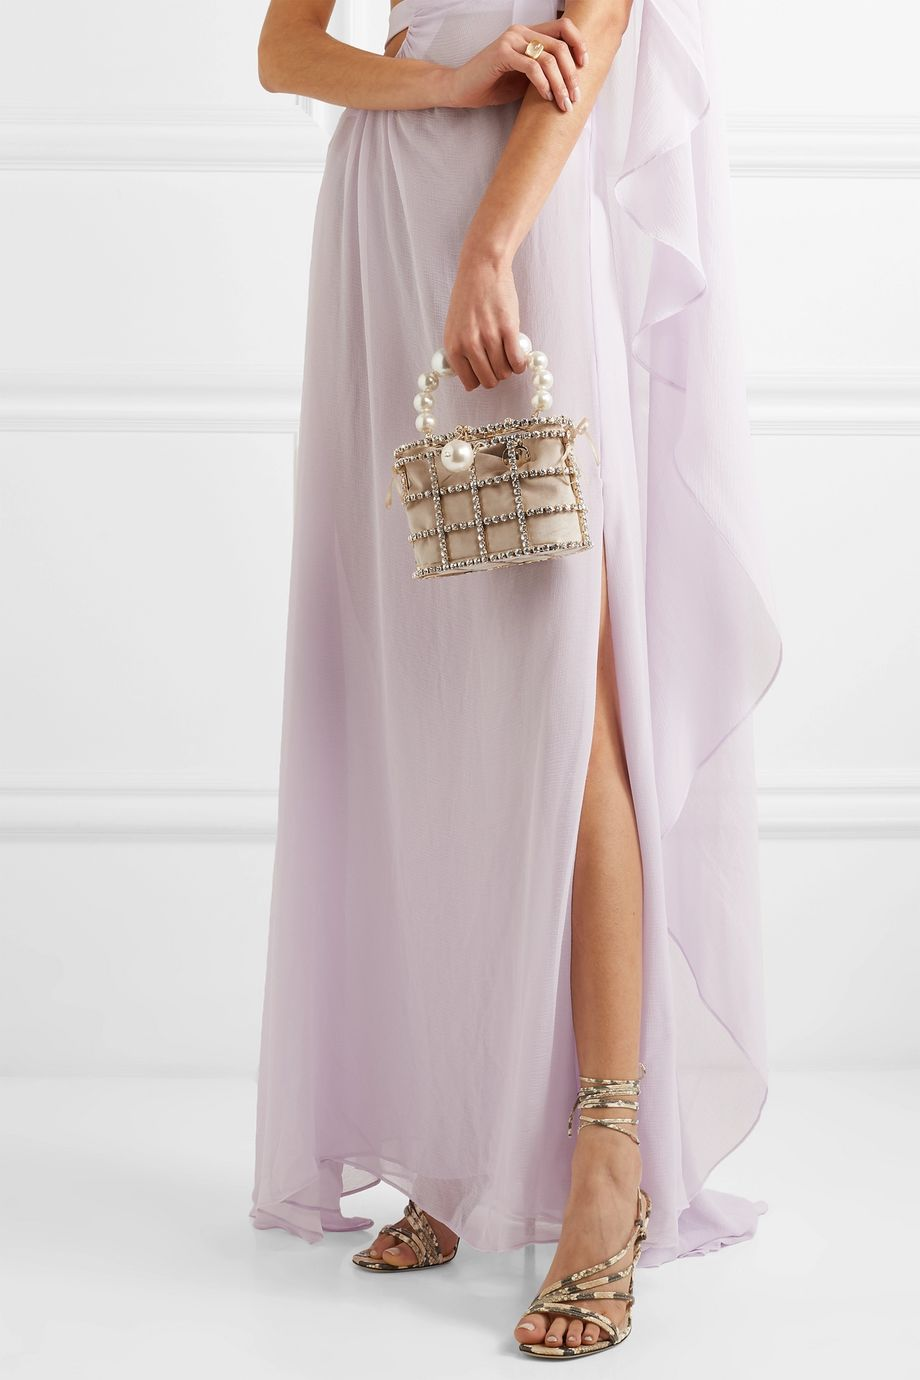 Rosantica Holli 带缀饰金色金属天鹅绒手提包